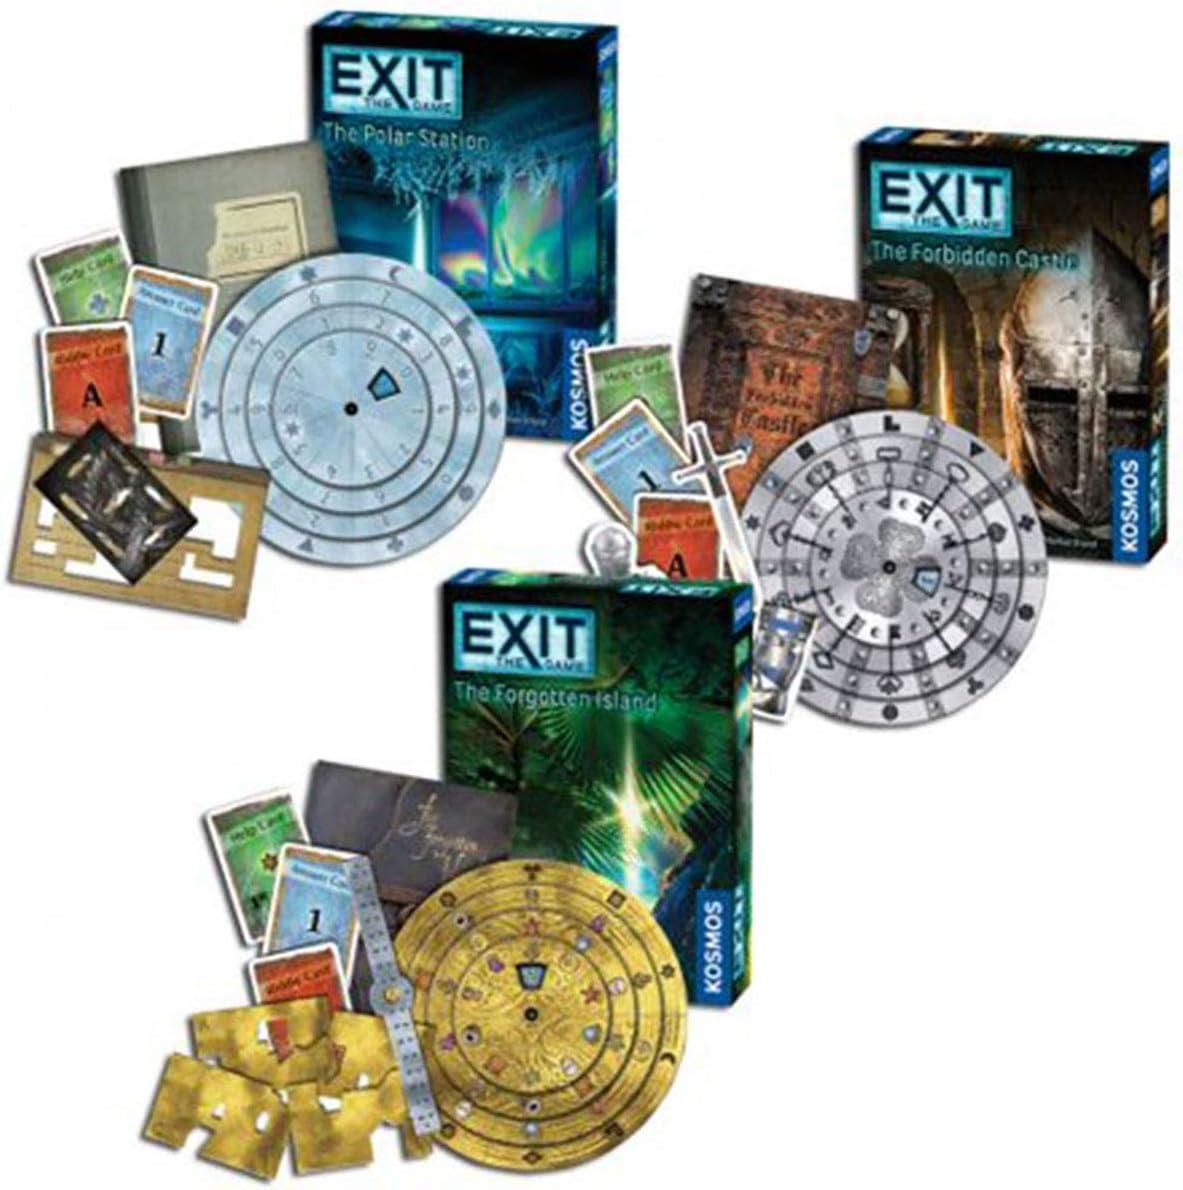 Thames & Kosmos Exit Games: Polar Station, Forbidden Castle, and Forgotten Island (Set of 3)